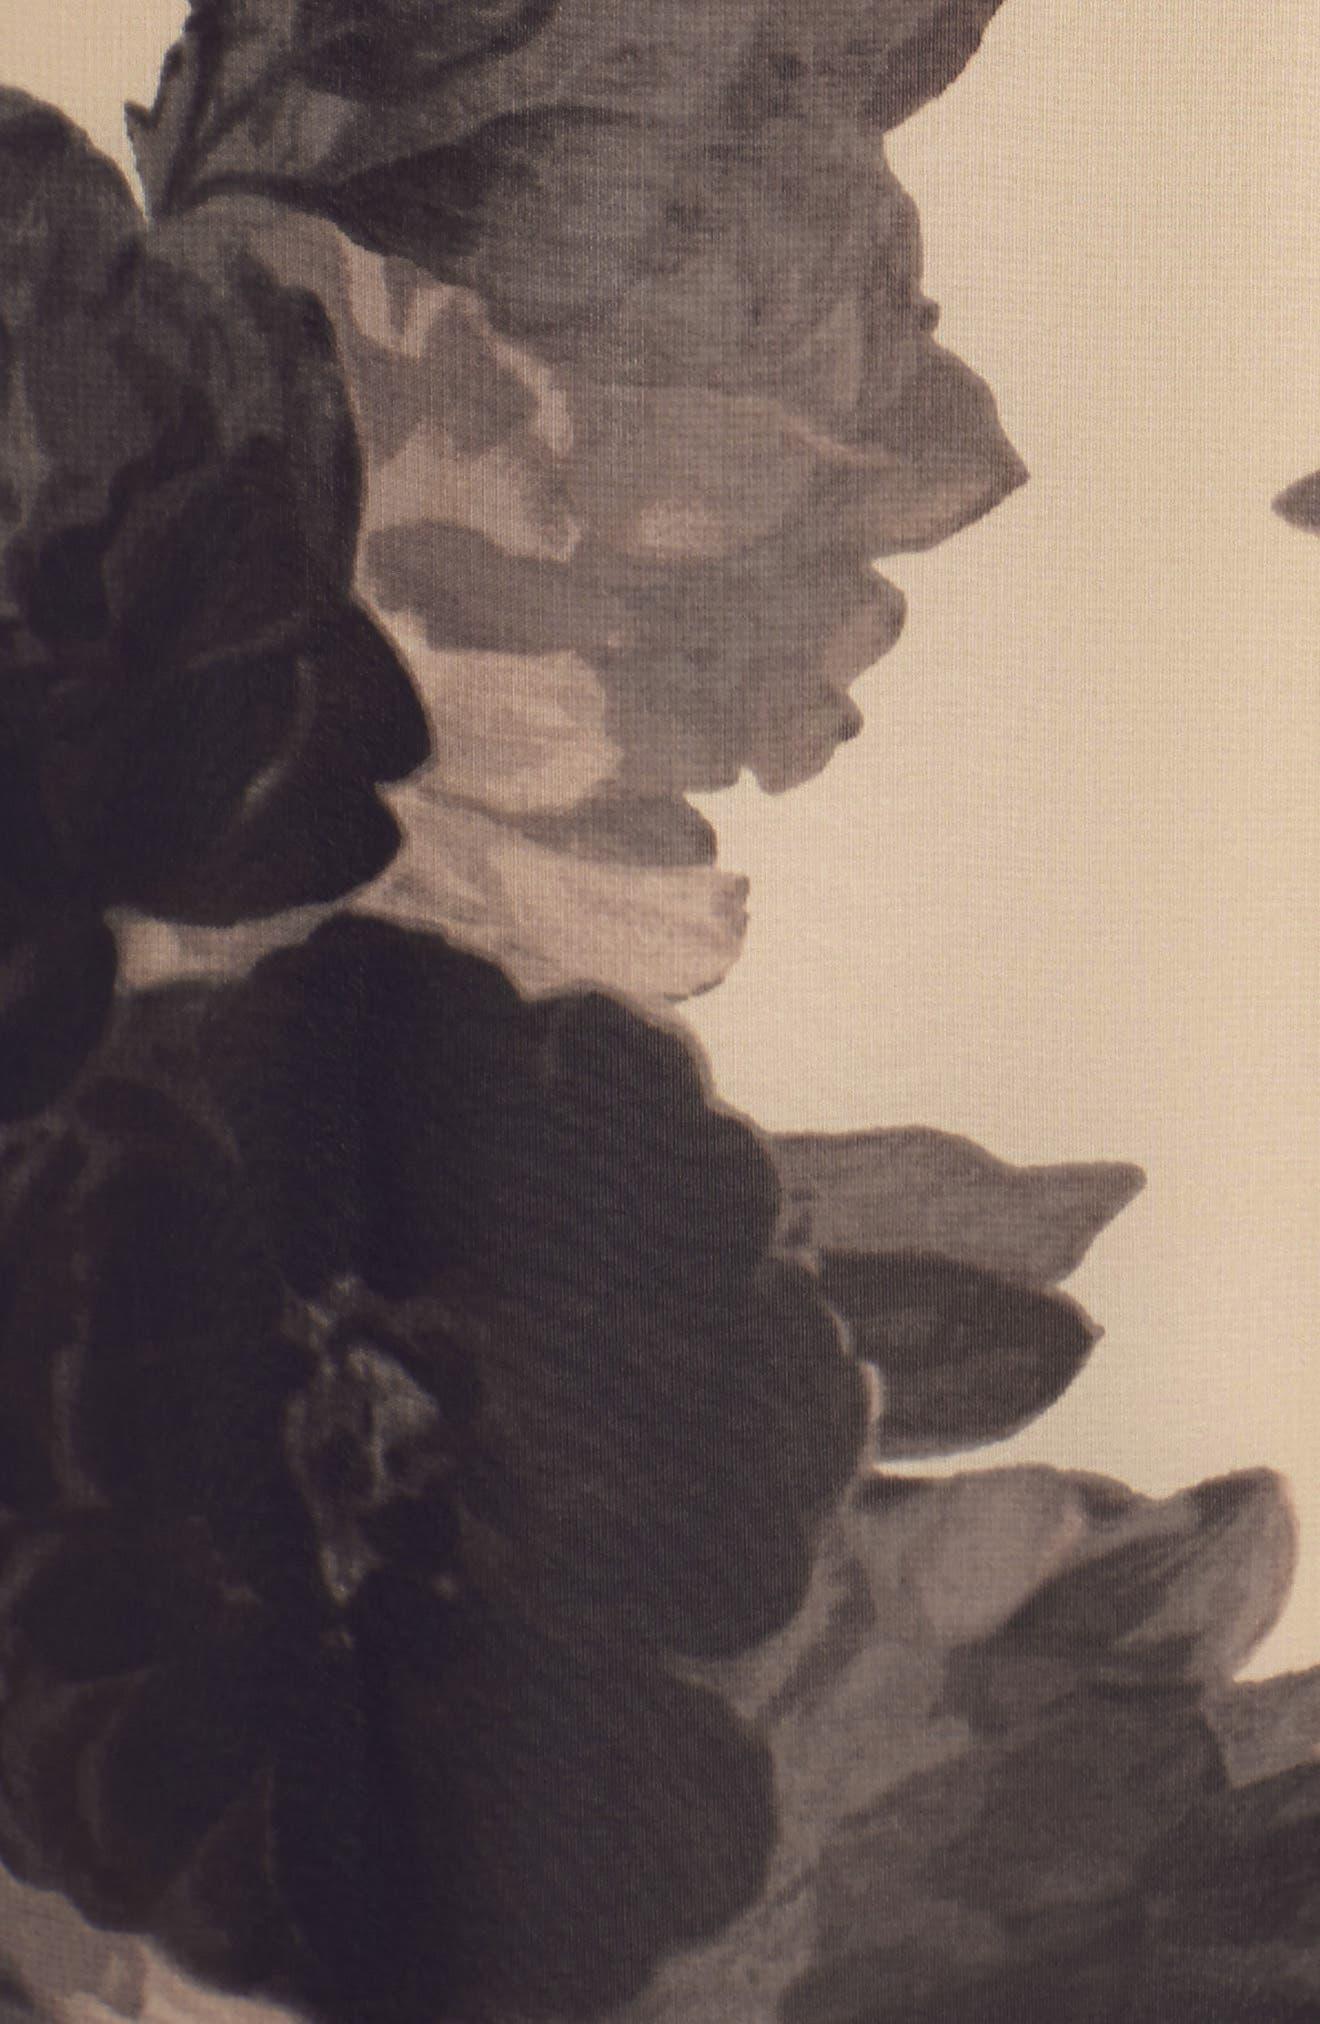 Floral Print Chiffon Maxi Dress,                             Alternate thumbnail 5, color,                             Taupe/ Black